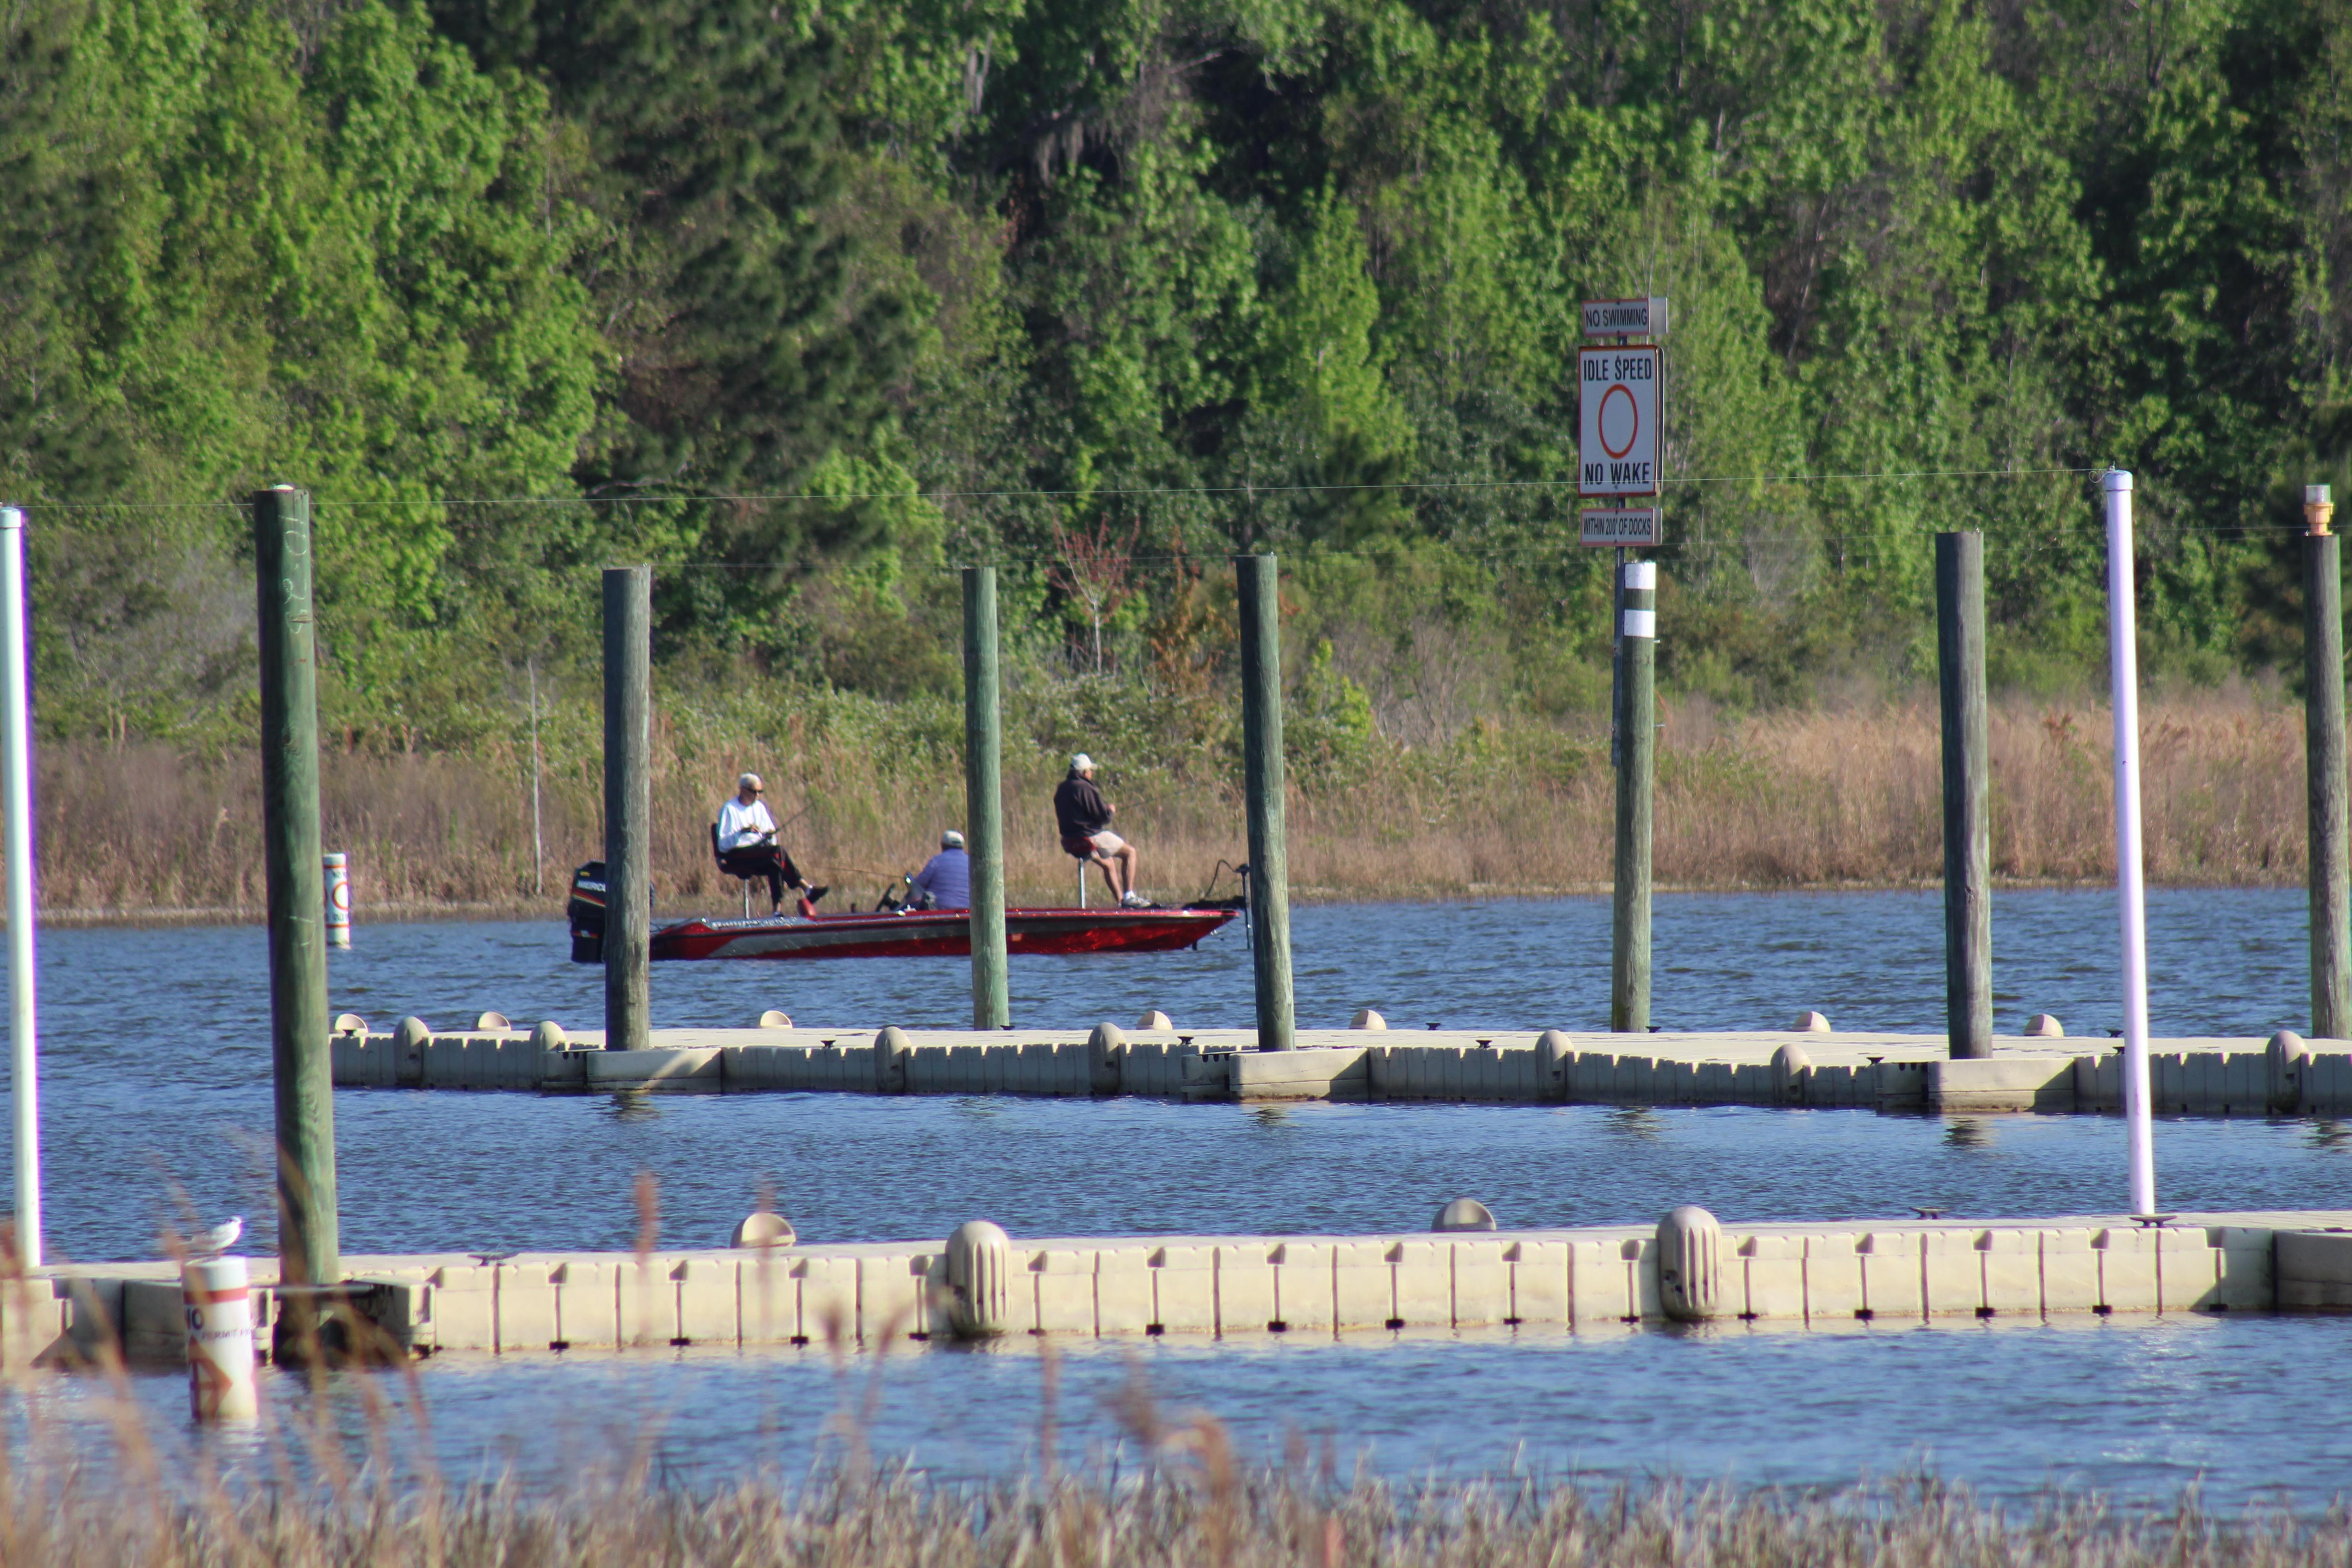 Lake weir, ocala news, ocklawaha, marion county news, beach reopens